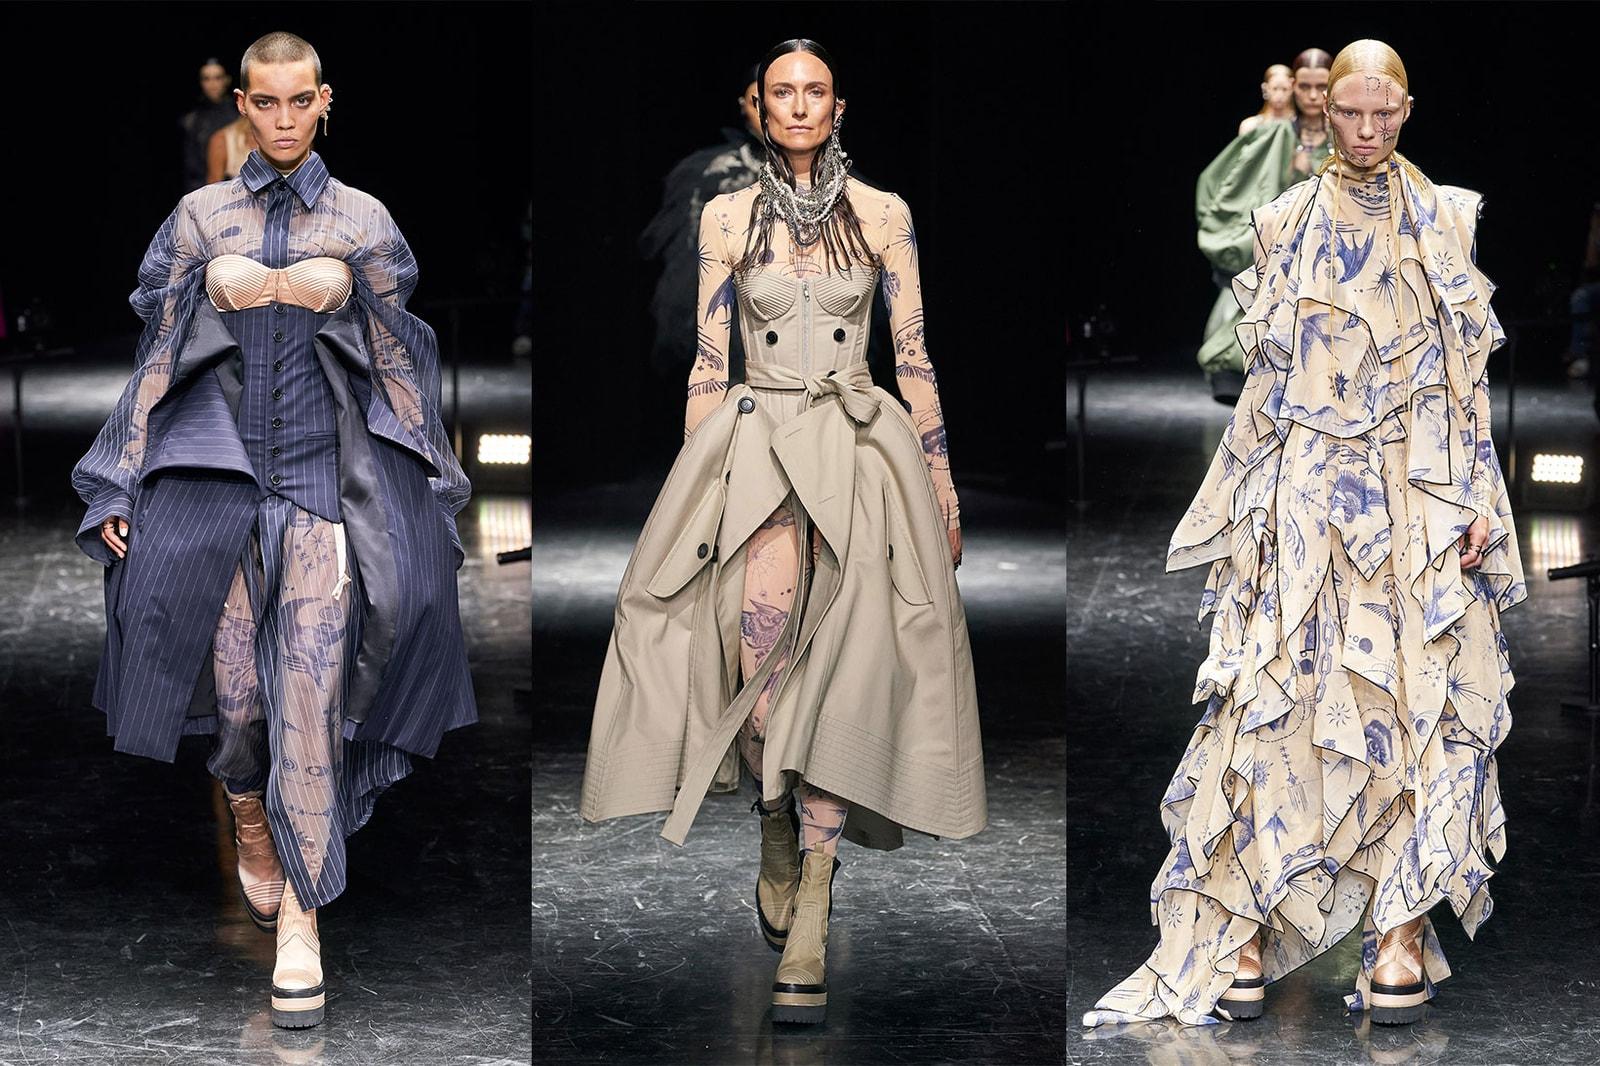 Paris Haute Couture Week 2021 Fall Winter Fashion Shows Collections Balenciaga Jean Paul Gaultier Sacai Chitose Abe Schiaparelli Iris Van Herpen